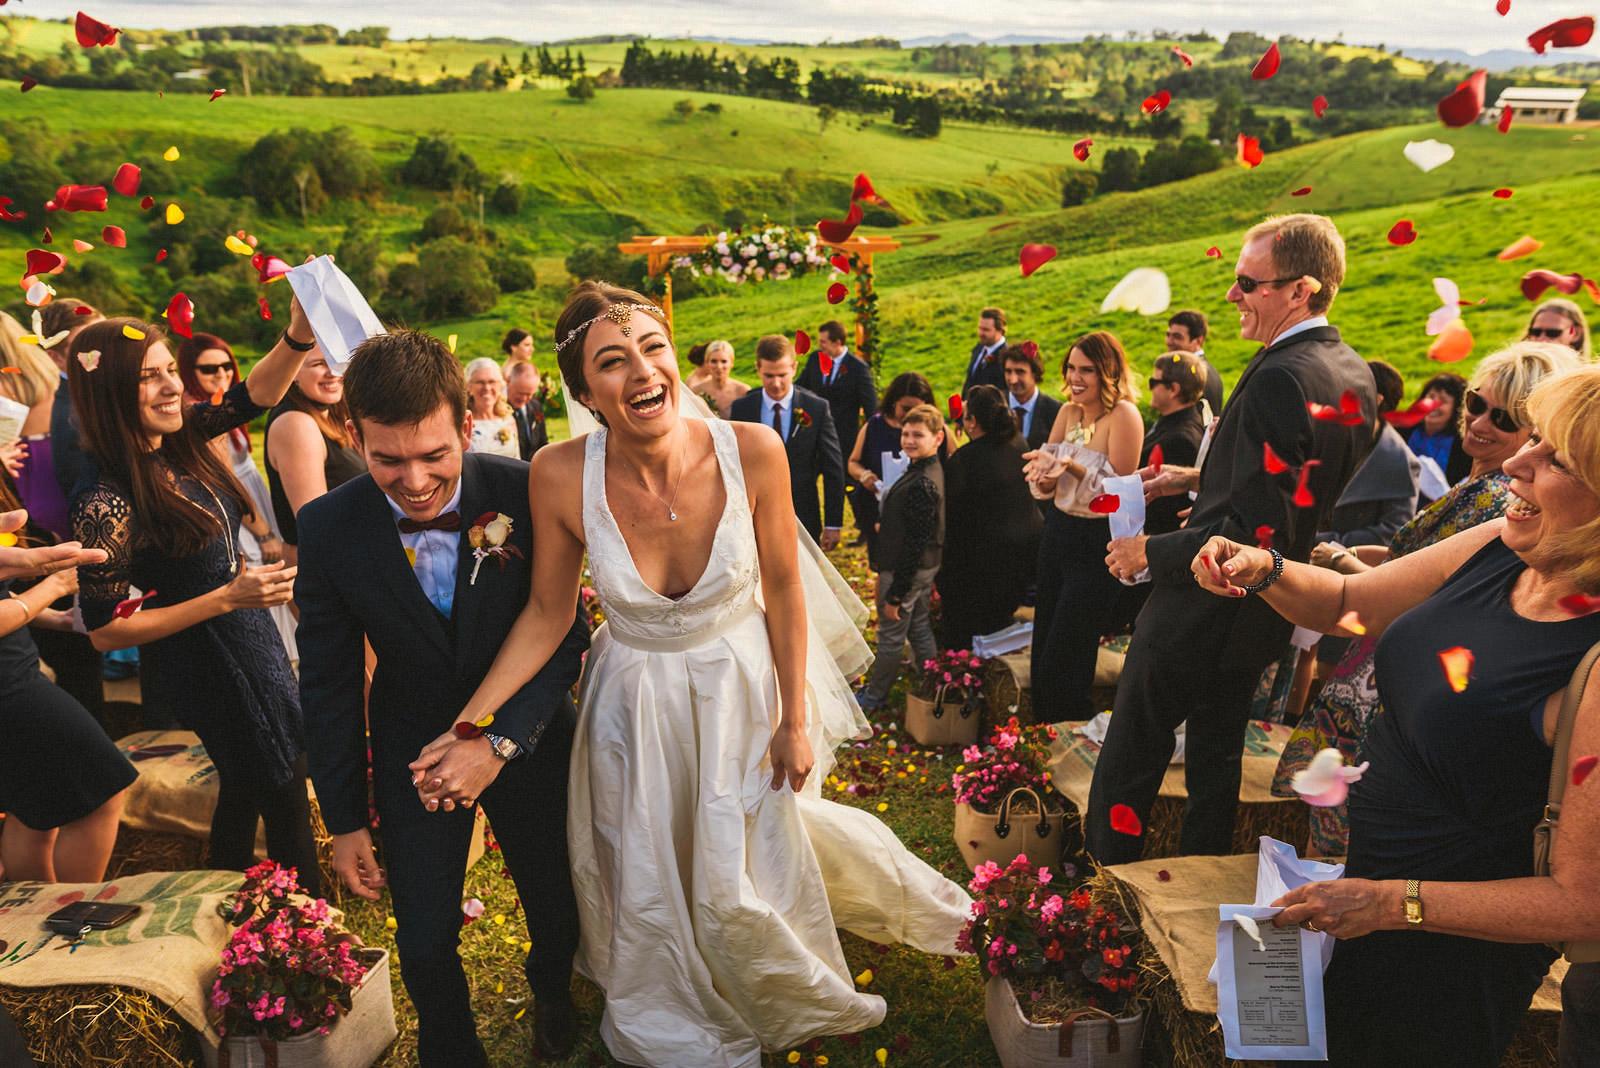 tablelands_wedding_0022